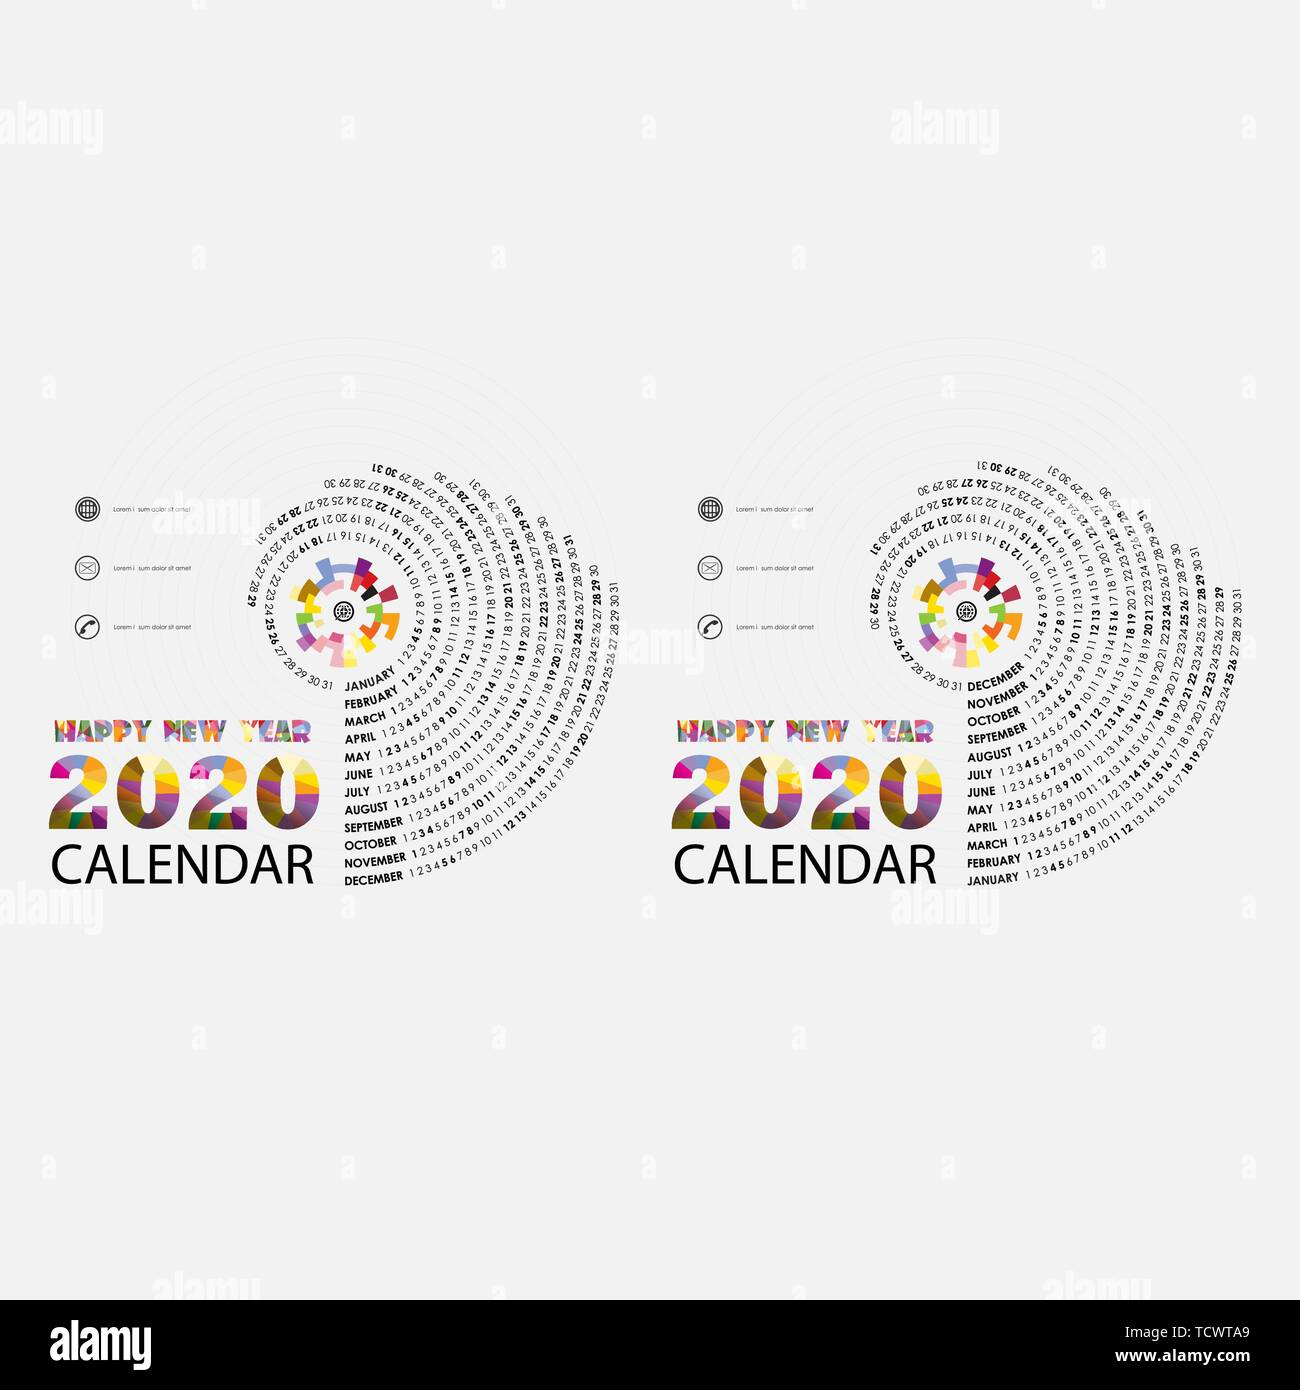 Wta Calendar 2020 October Calendar Stock Photos & October Calendar Stock Images